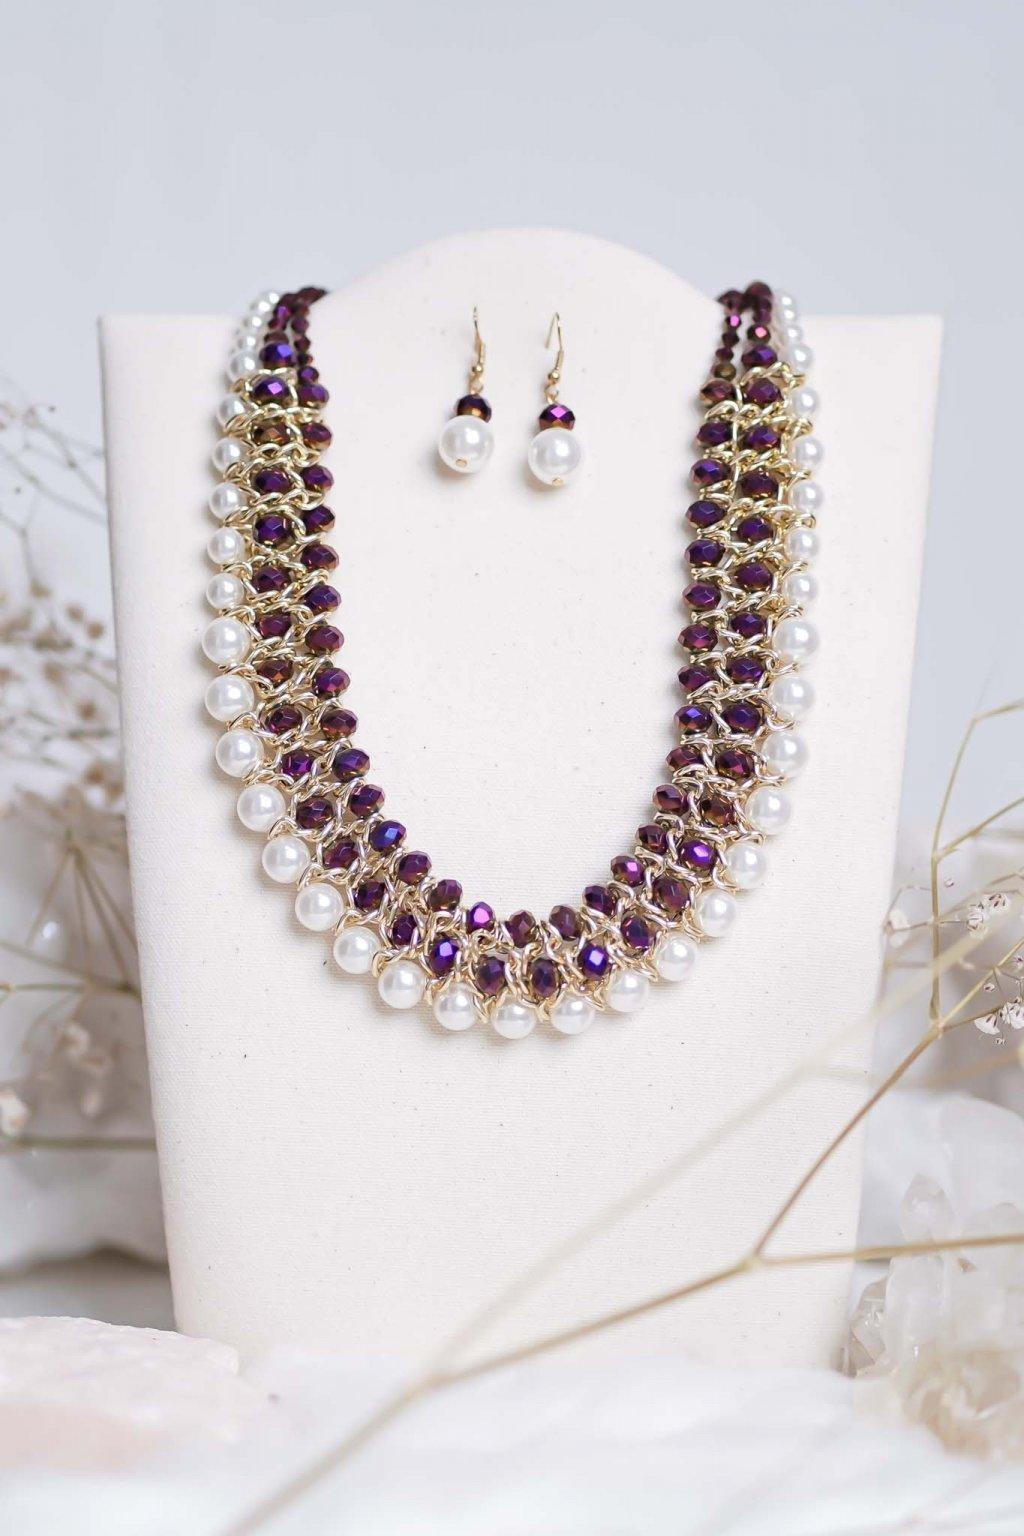 náhrdelník, šperk, spoločenská náhrdelník, náhrdelník na bežný deň, výrazný náhrdelník, jemný náhrdelník, šperky, náhrdelník na ples, svadbu, stužkovú 31